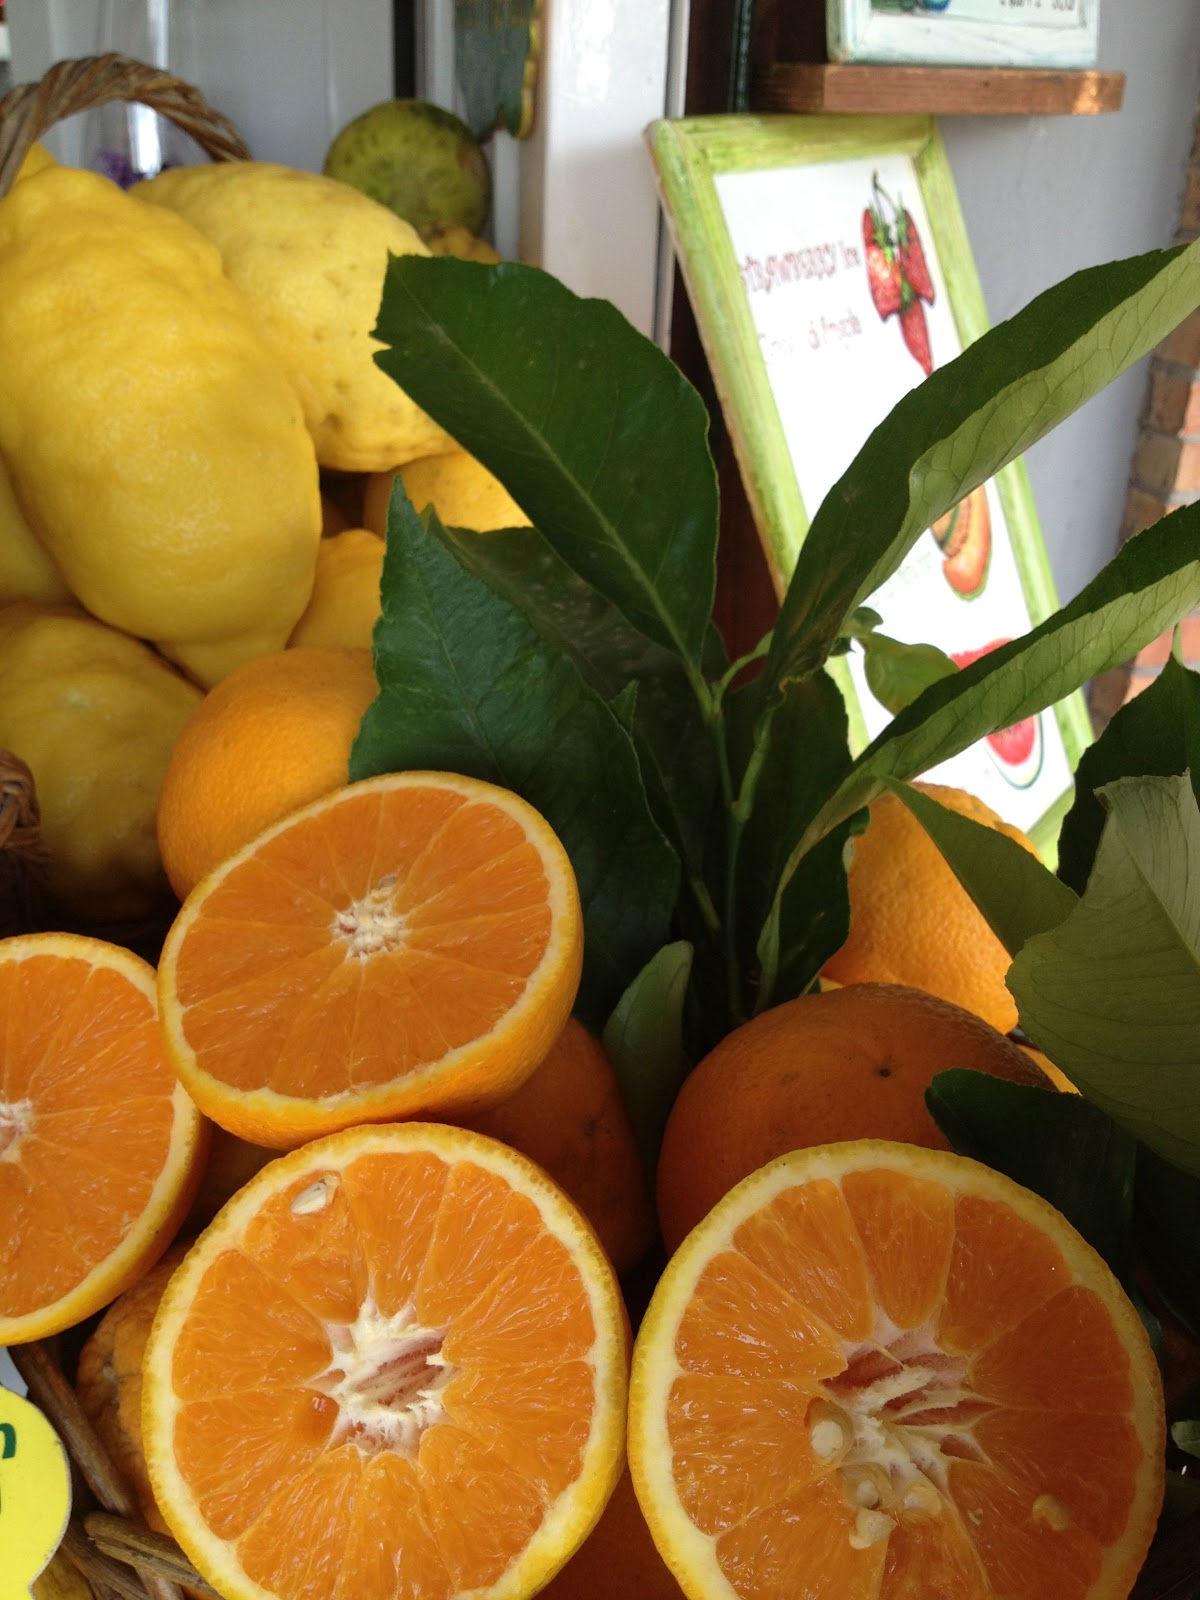 Gillian S Lists Capri Energy Drink